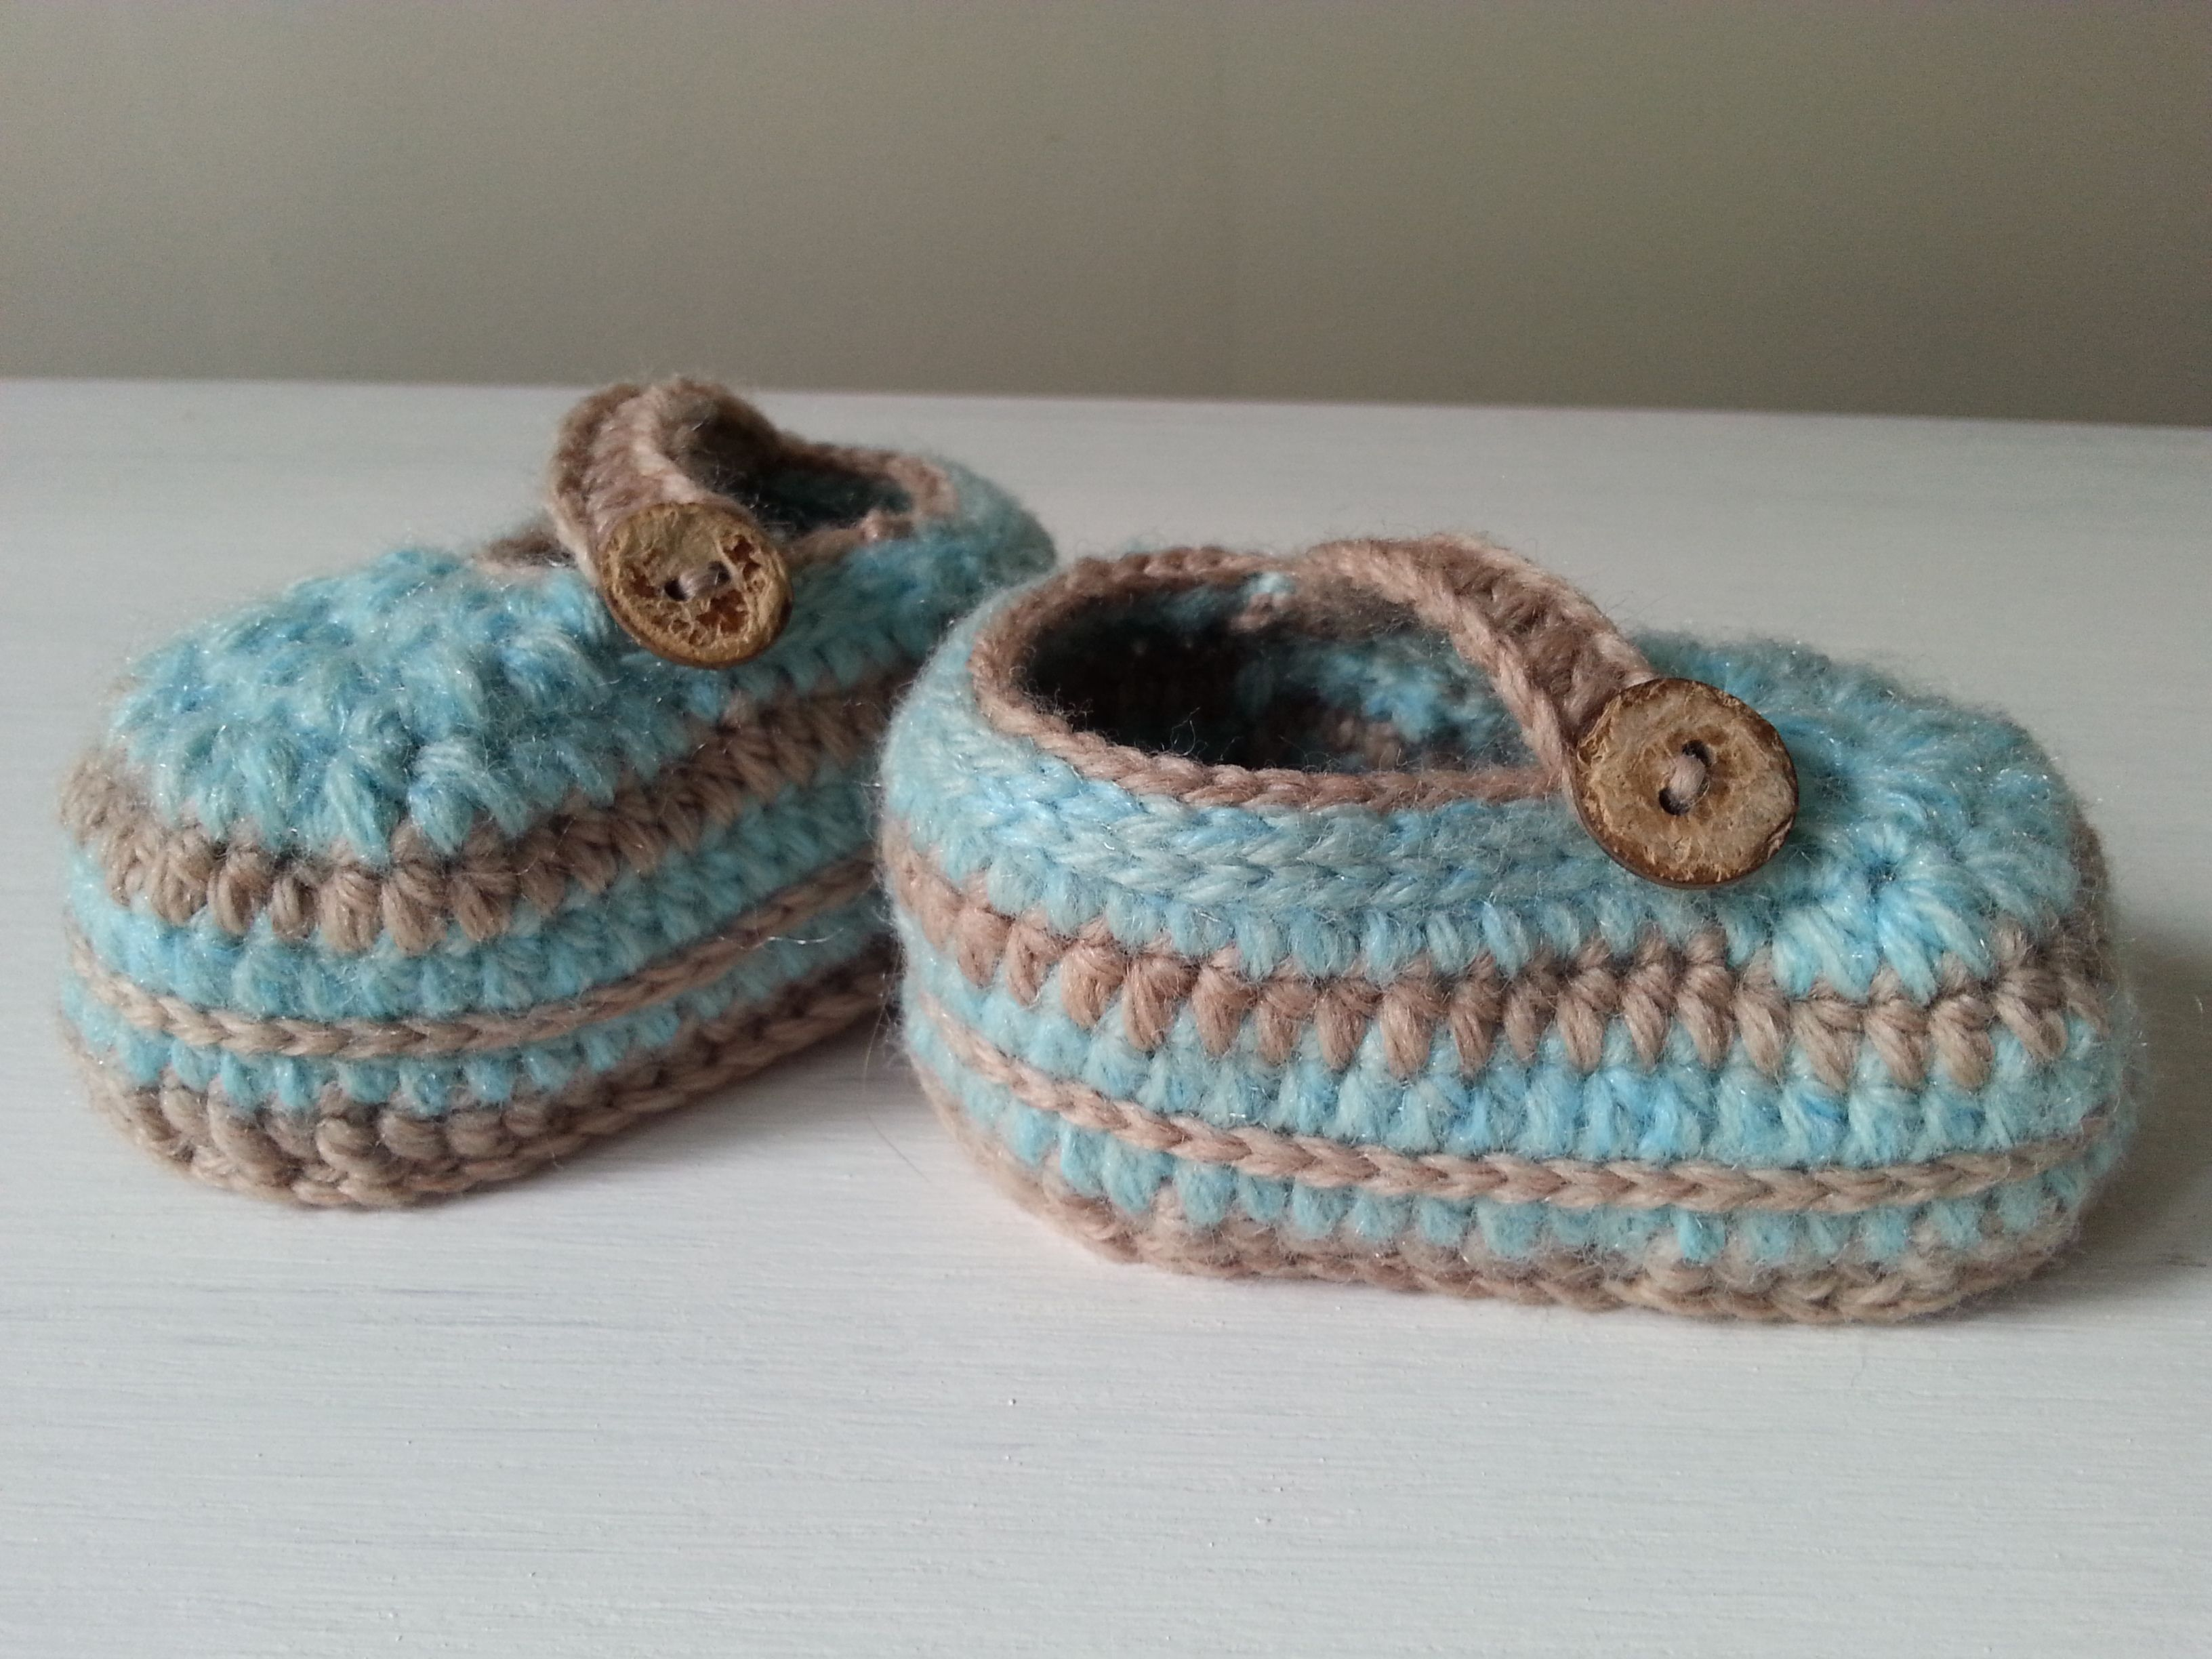 Pin On My Crochet Projects Moje Prace Szydelko